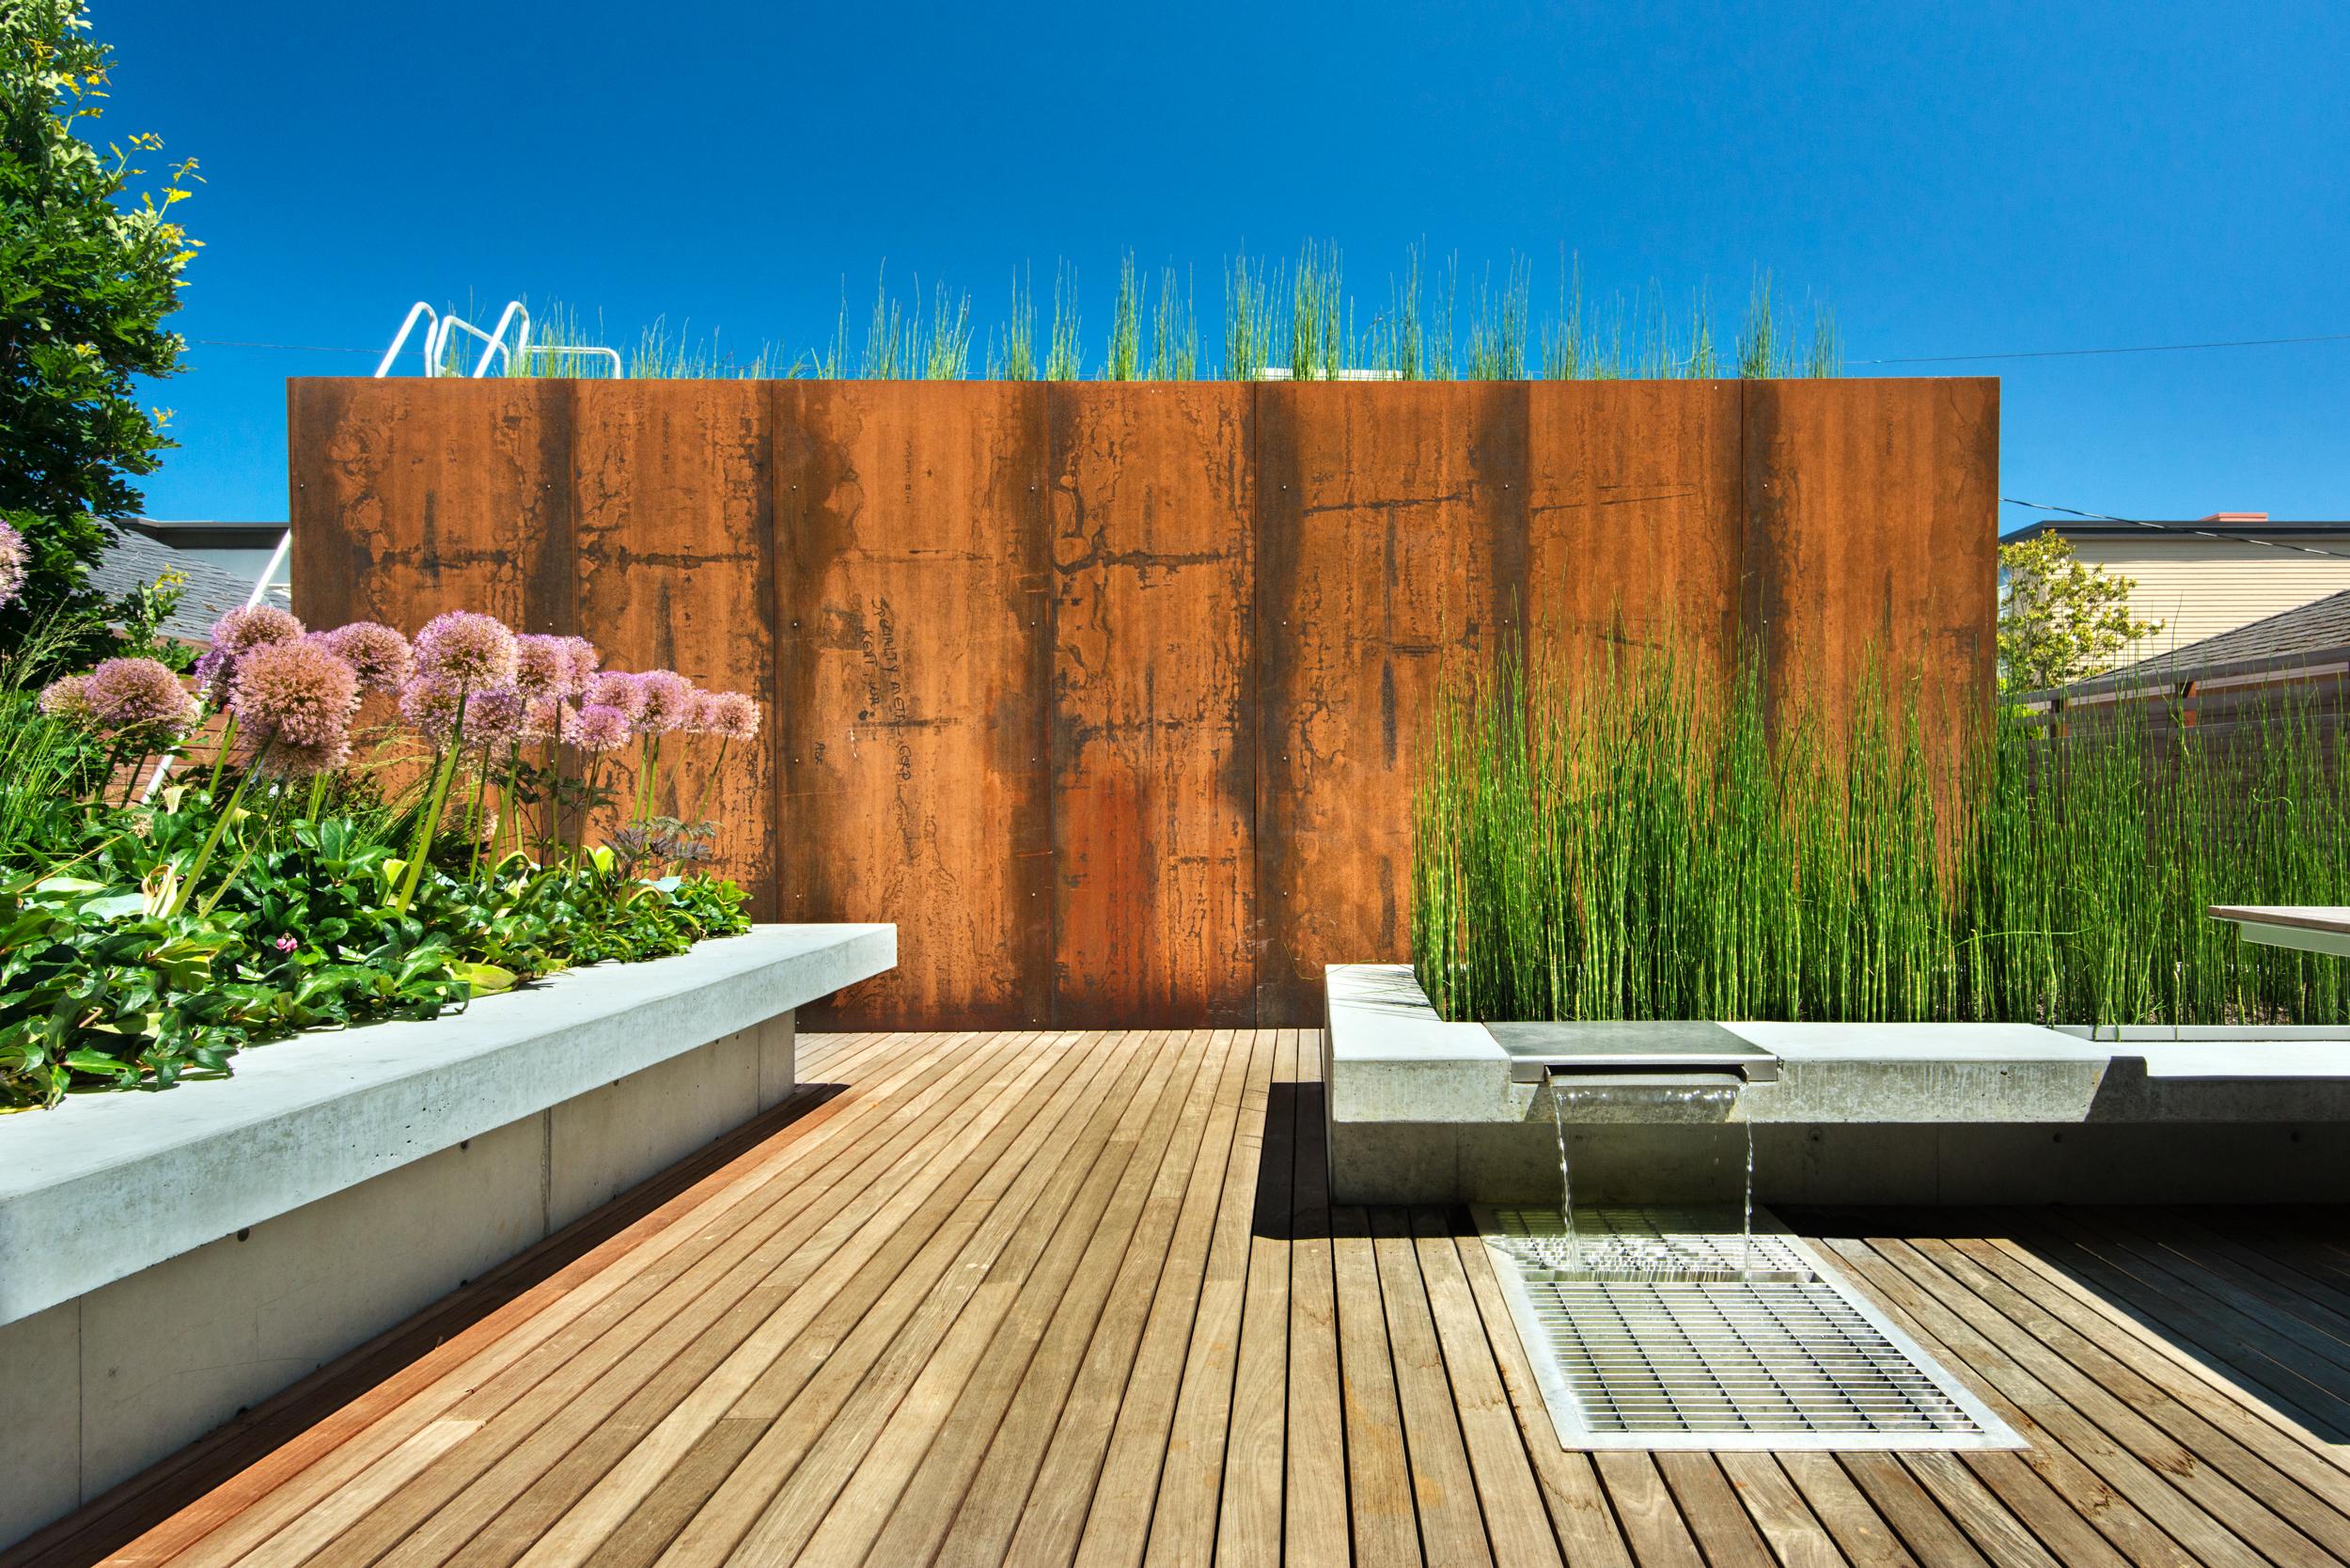 Roof top garden with raise conten steel platform and water feature